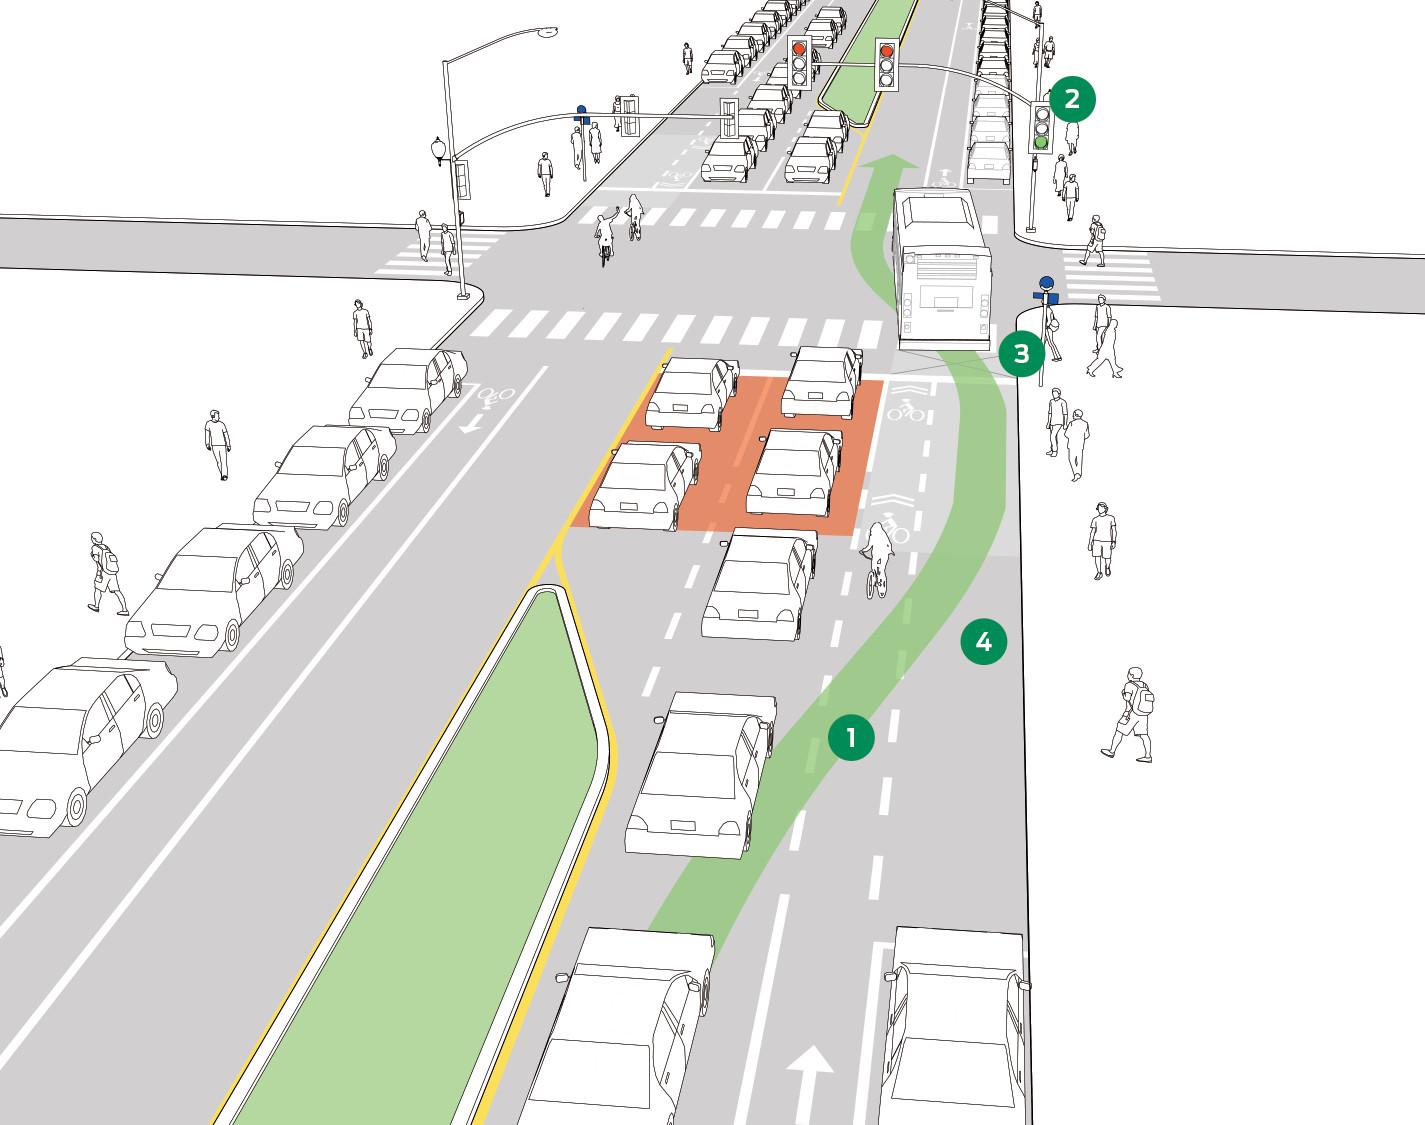 Queue Jump Lanes | National Association of City Transportation Officials